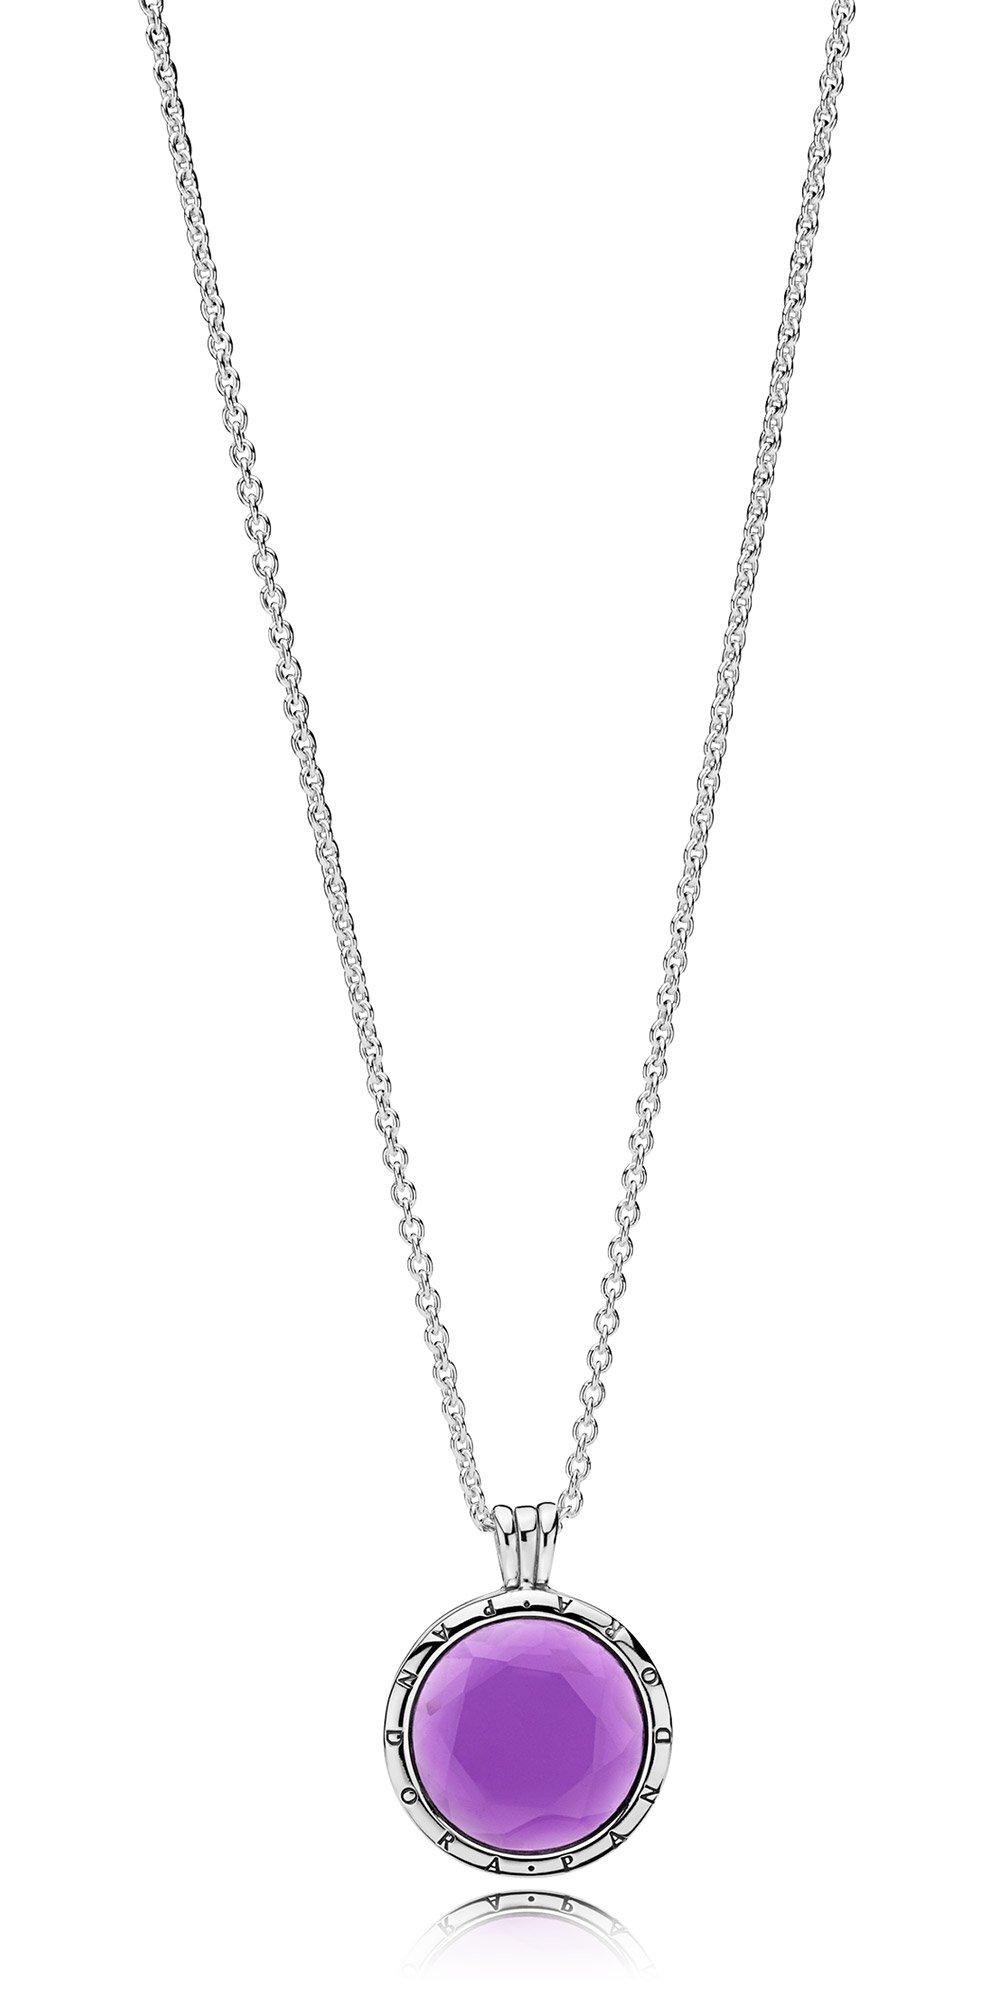 Pandora 397710sam 60 Ladies´ Necklace Faceted Floating Locket Regarding 2020 Pandora Lockets Logo Necklaces (View 15 of 25)